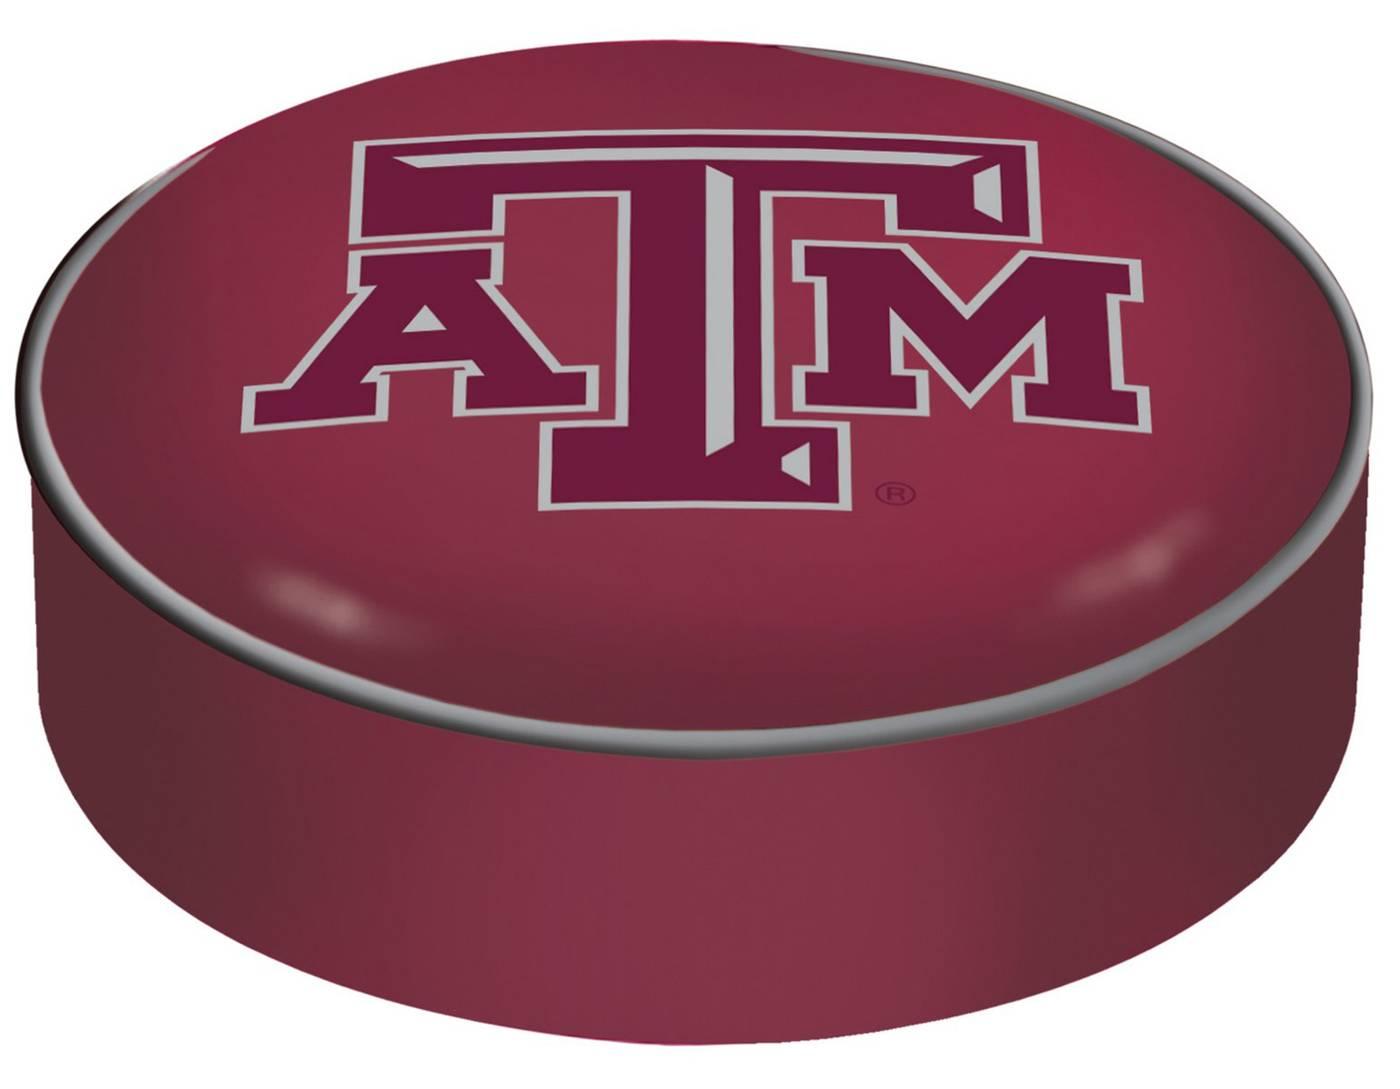 Texas AampM Aggies Bar Stool Seat Cover : texas am aggies bar stool seat covermainProductImageFullSize from www.sportsunlimitedinc.com size 1000 x 833 jpeg 56kB